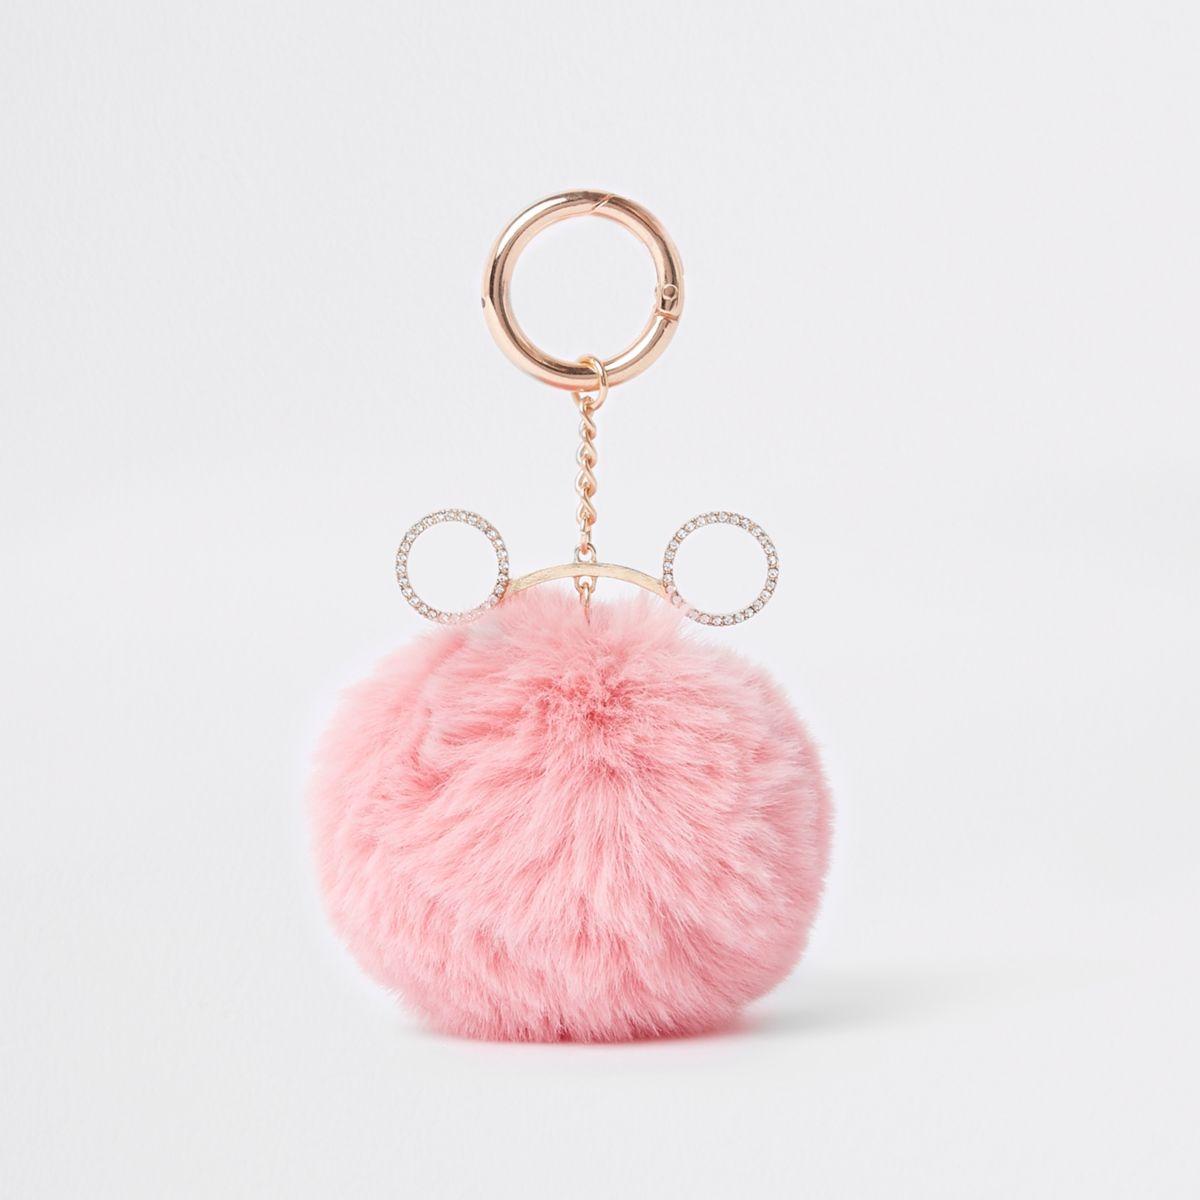 Pink faux fur pom pom keyring